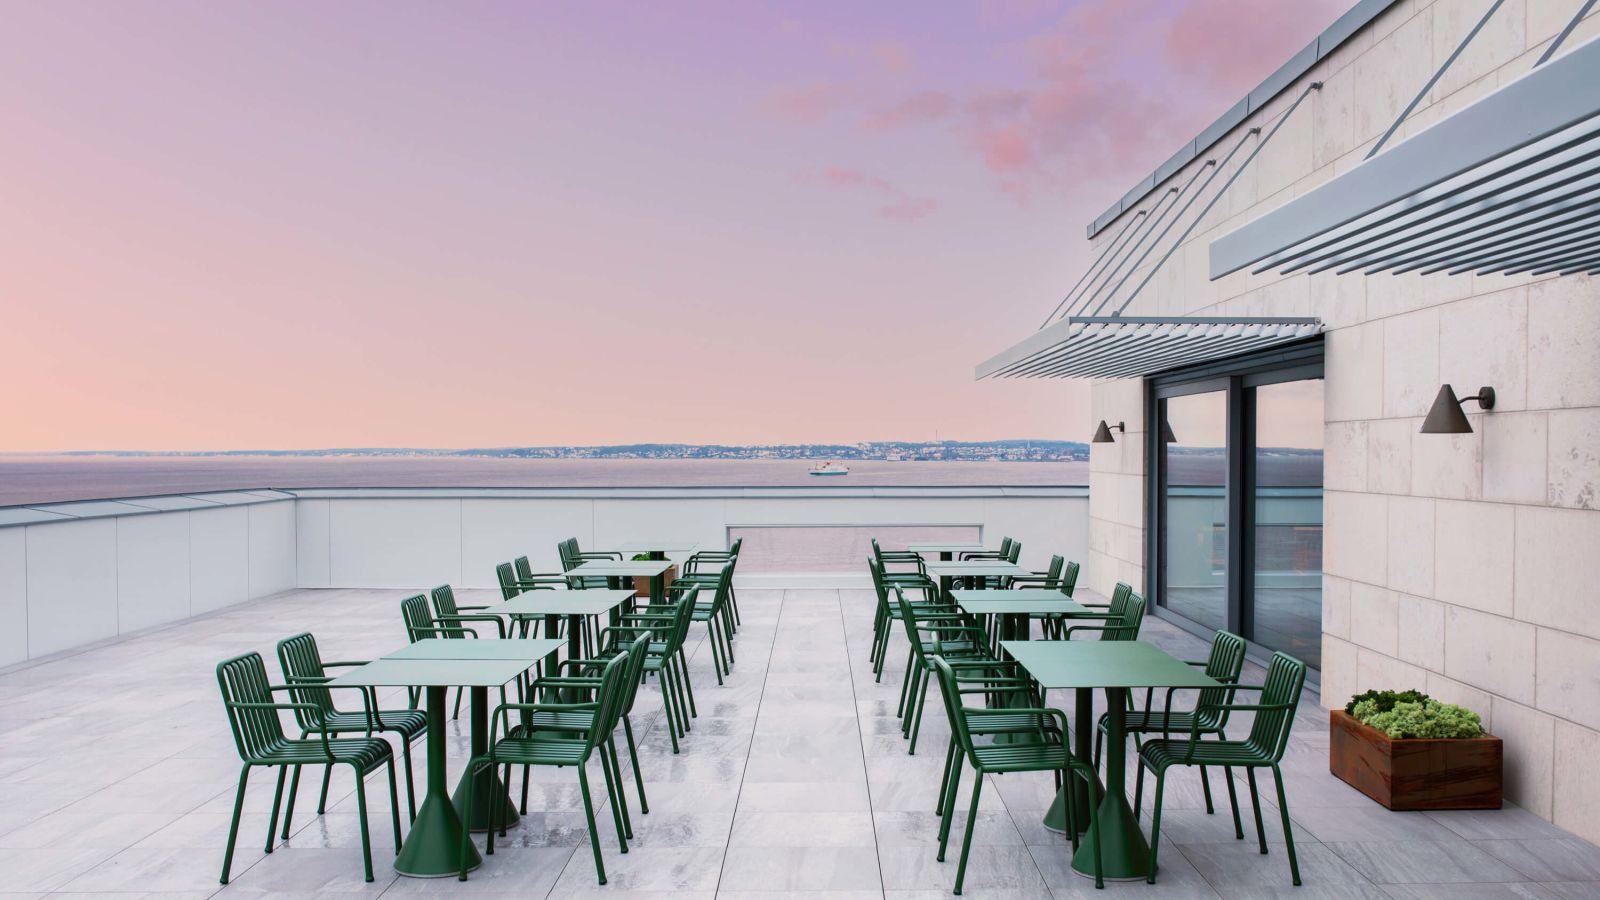 Rooftop bar at Clarion Hotel Sea U